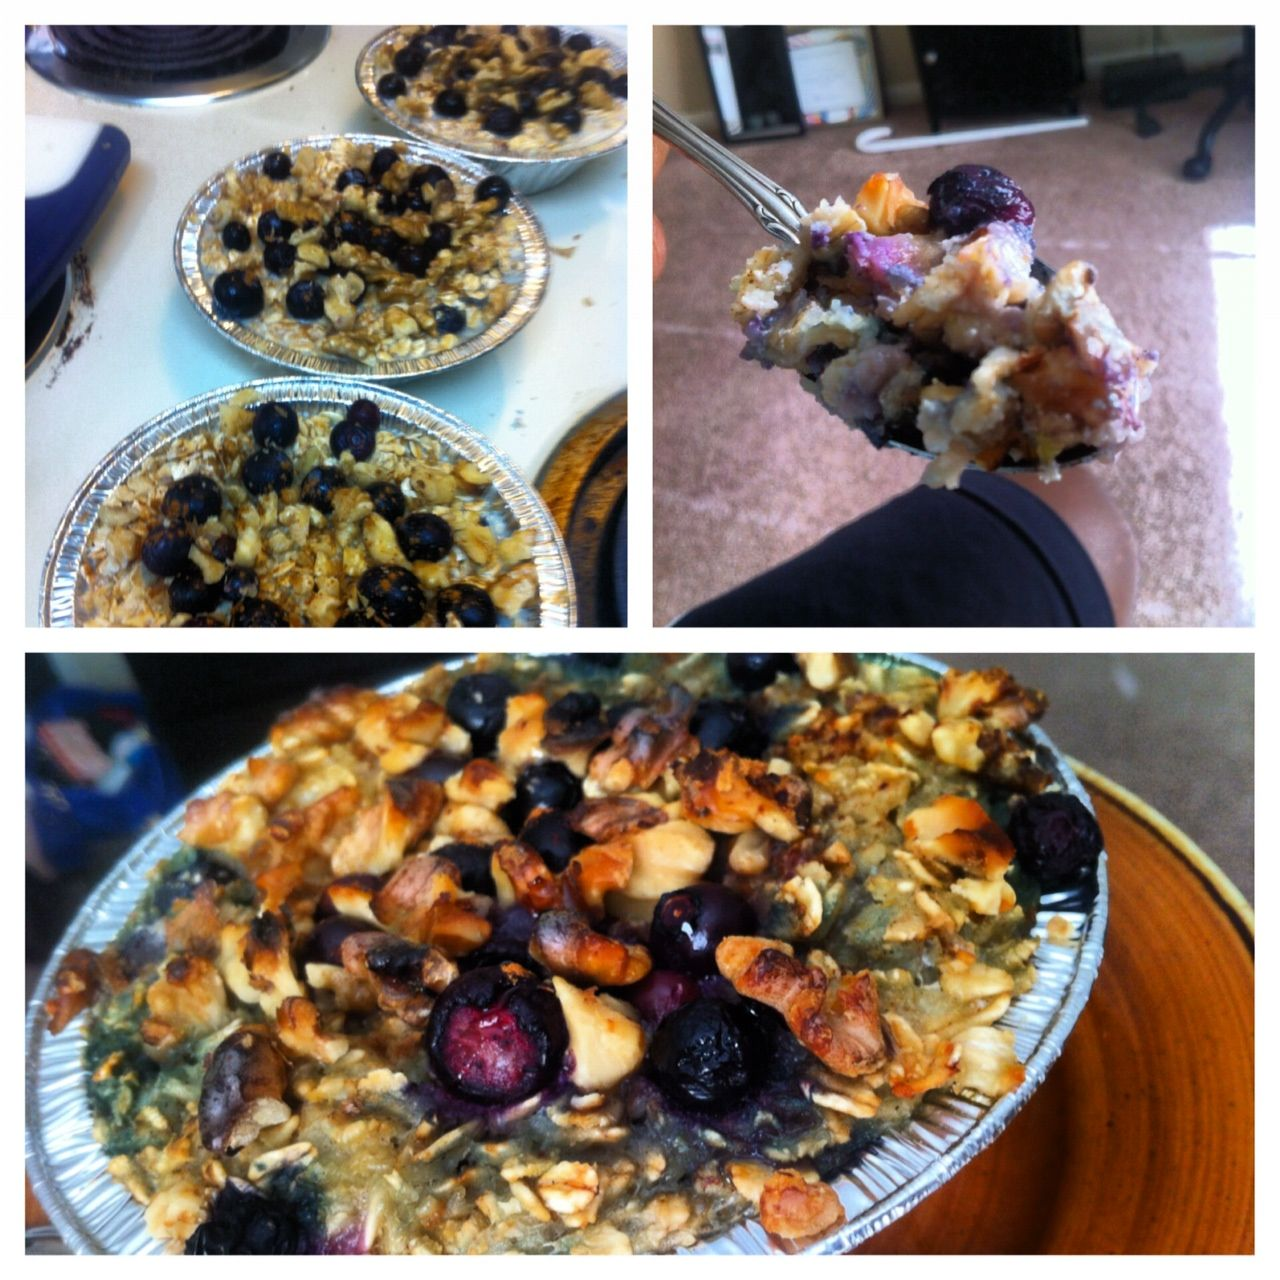 Baked Banana Blueberry Oatmeal Recipe Injoy Food and Fitness